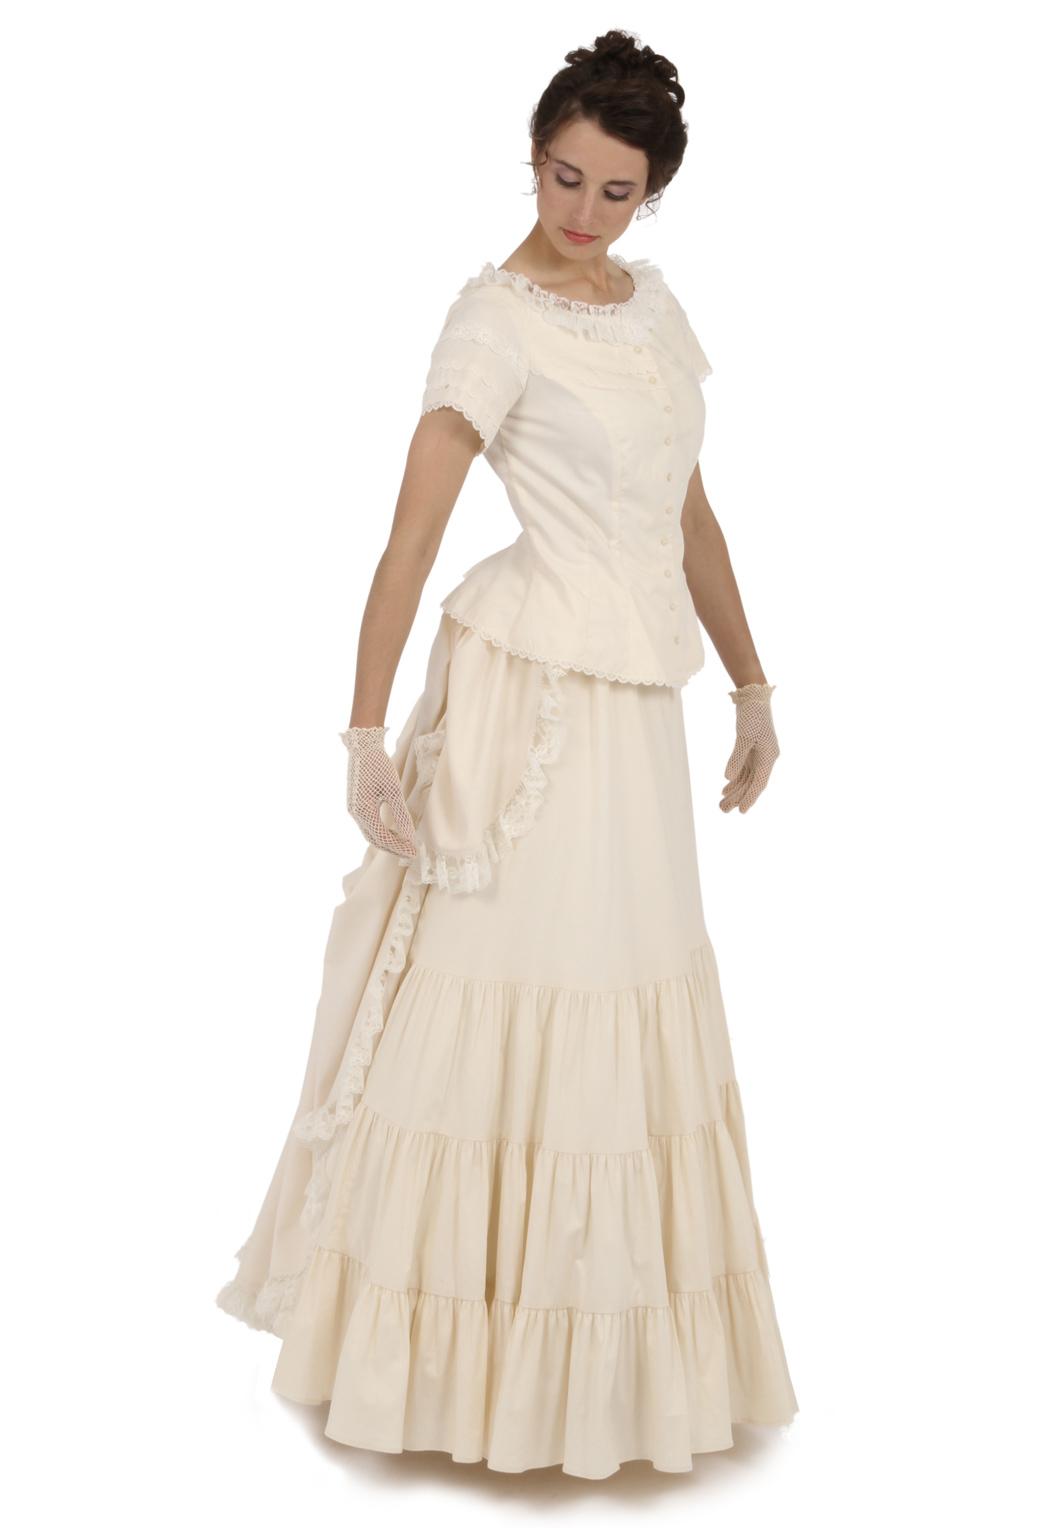 Jessie Victorian Cotton Dress | Recollections